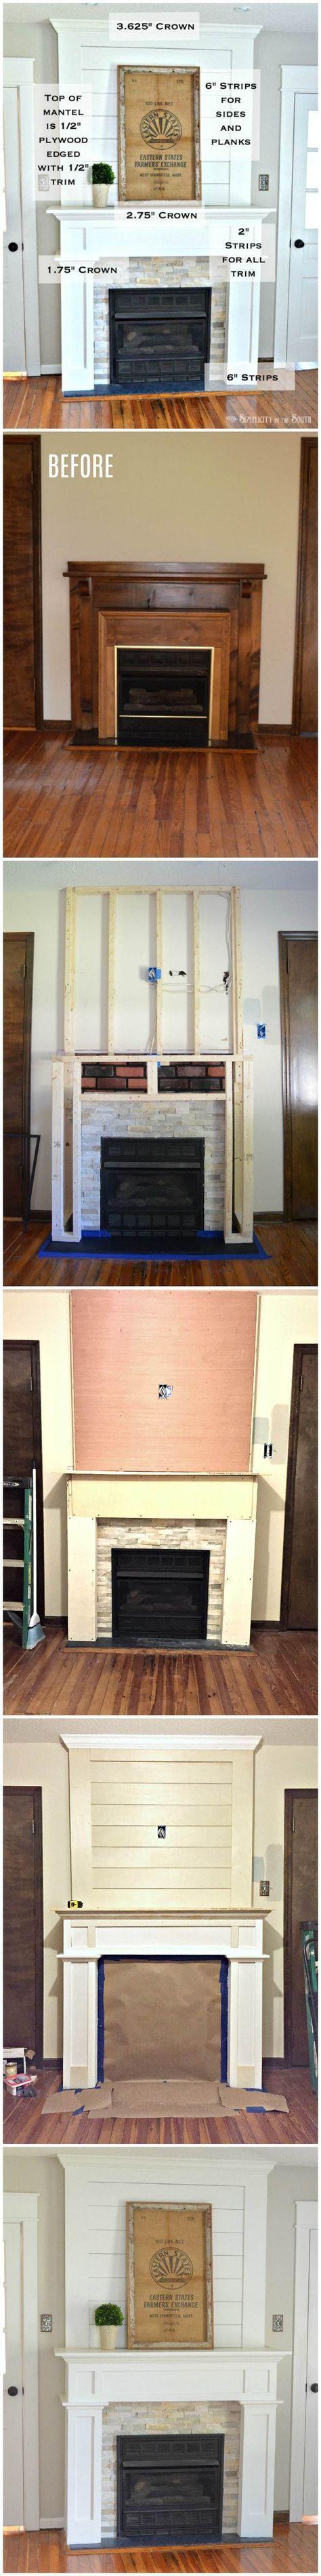 the 25 best fireplace remodel ideas on pinterest mantle ideas